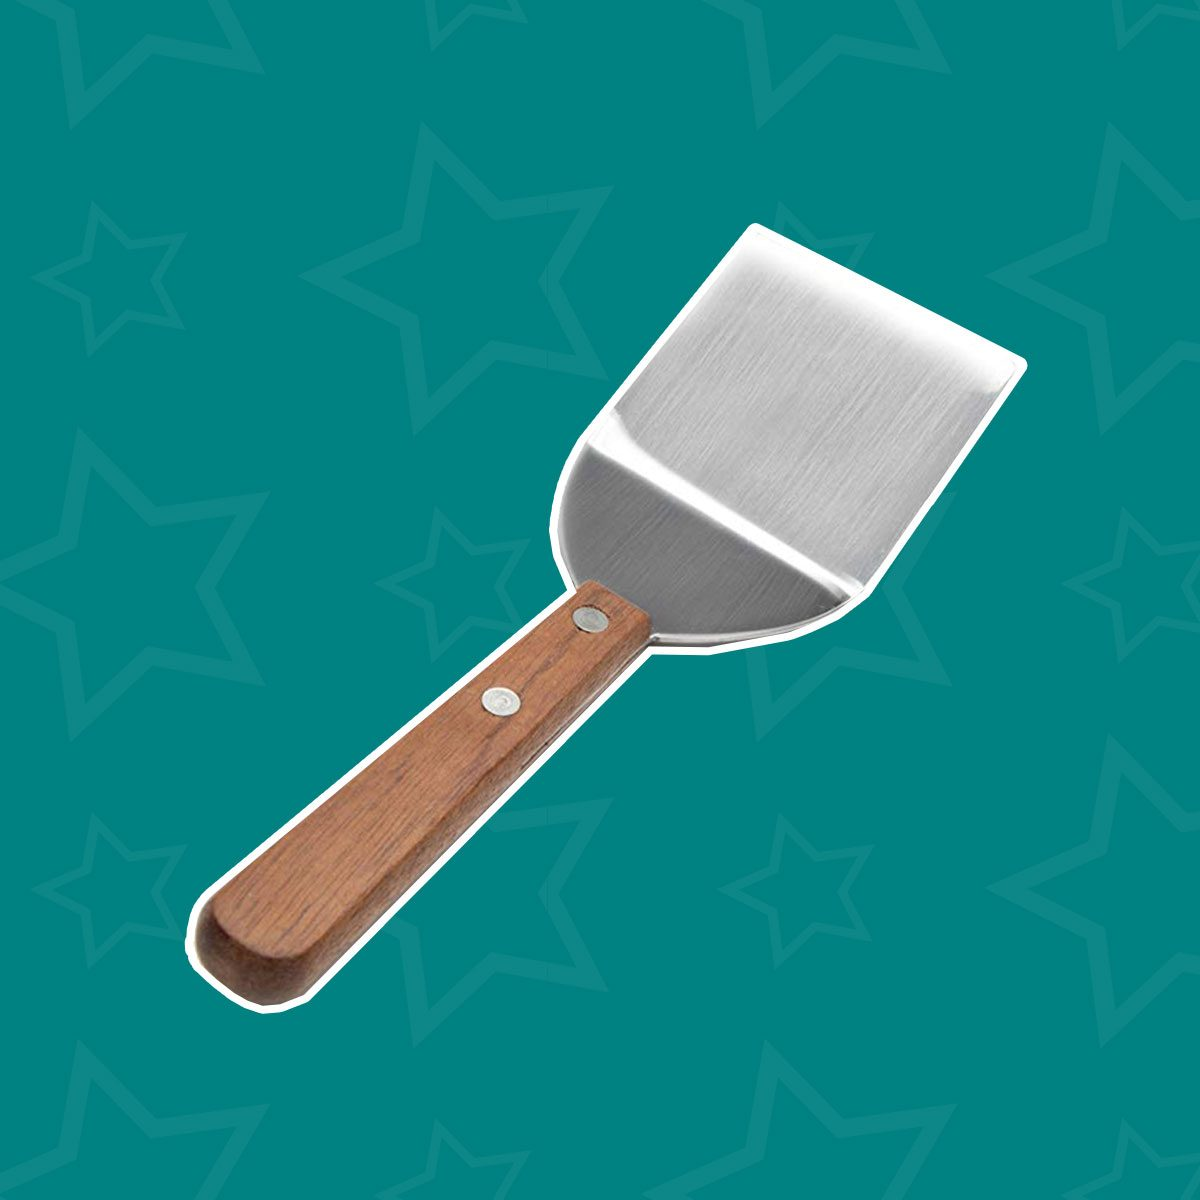 Brownie spatula